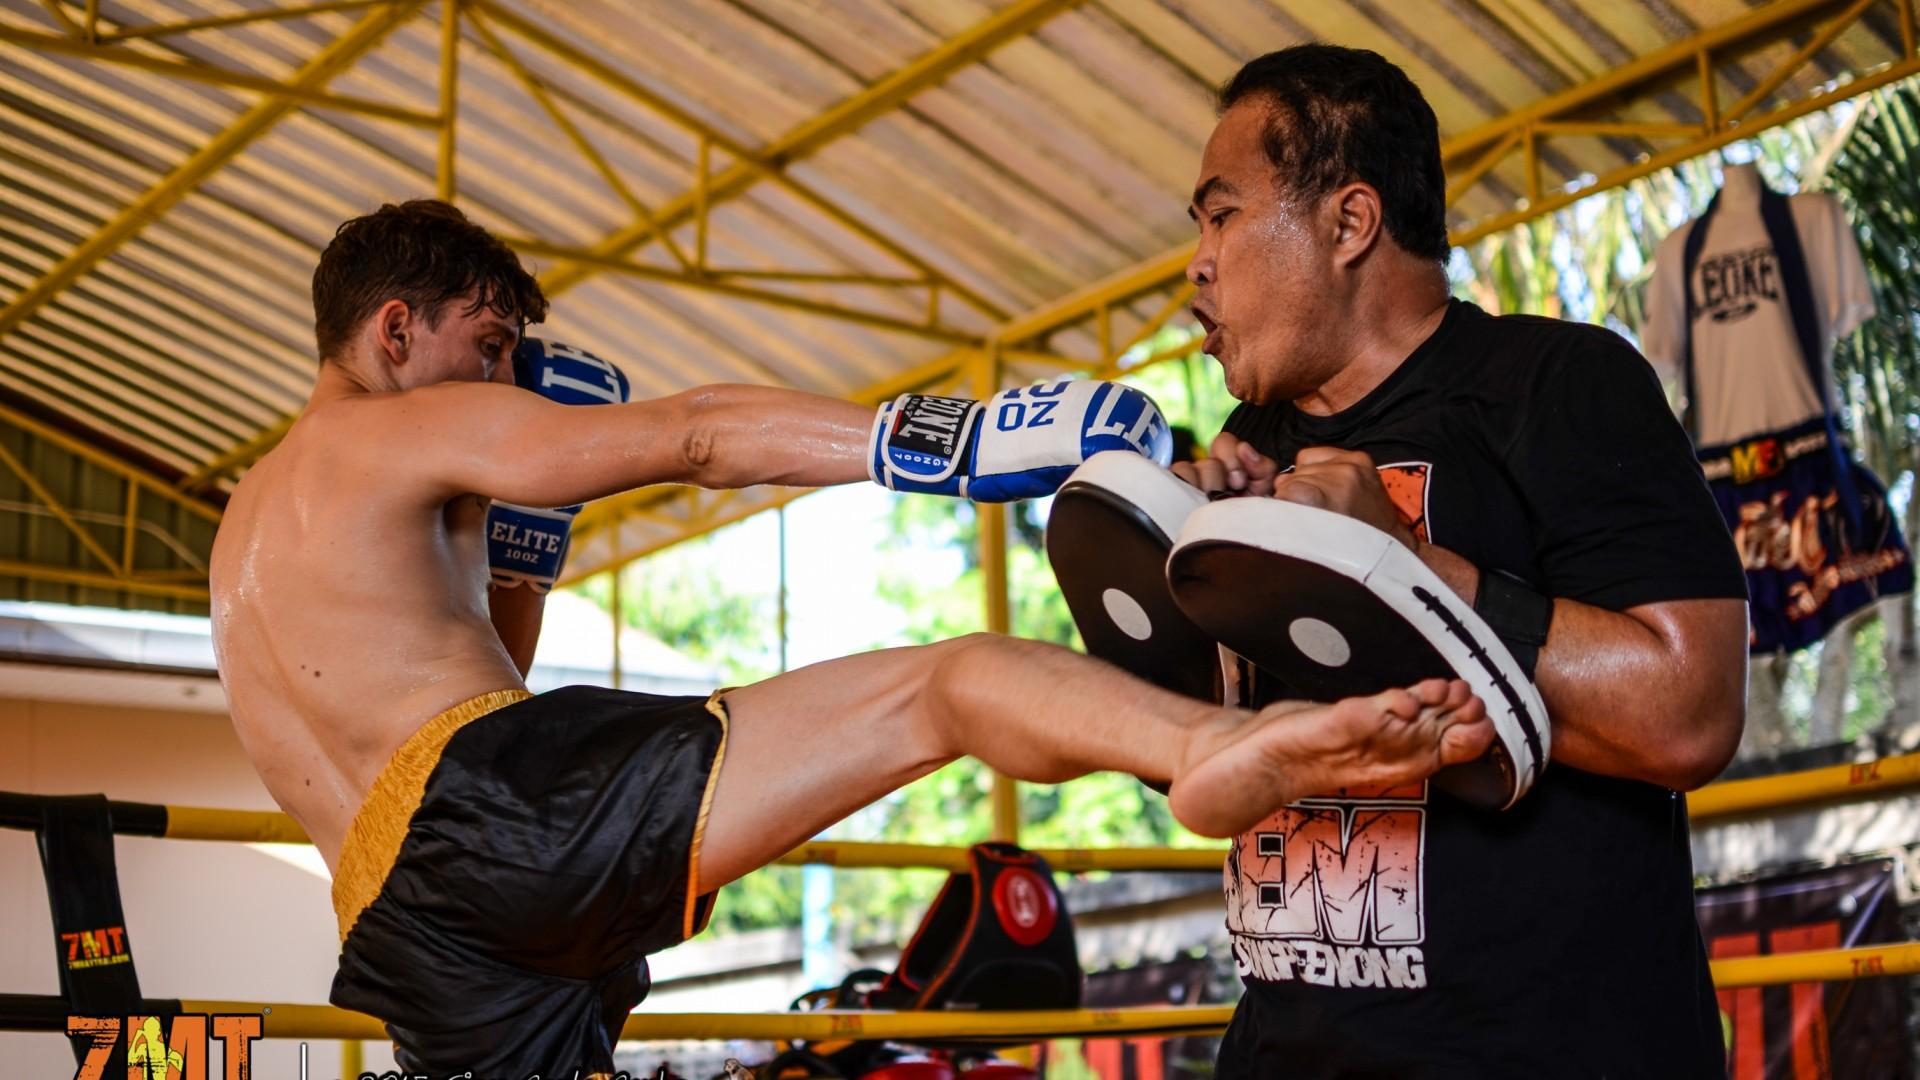 Allenamento Muay Thai - Thailand